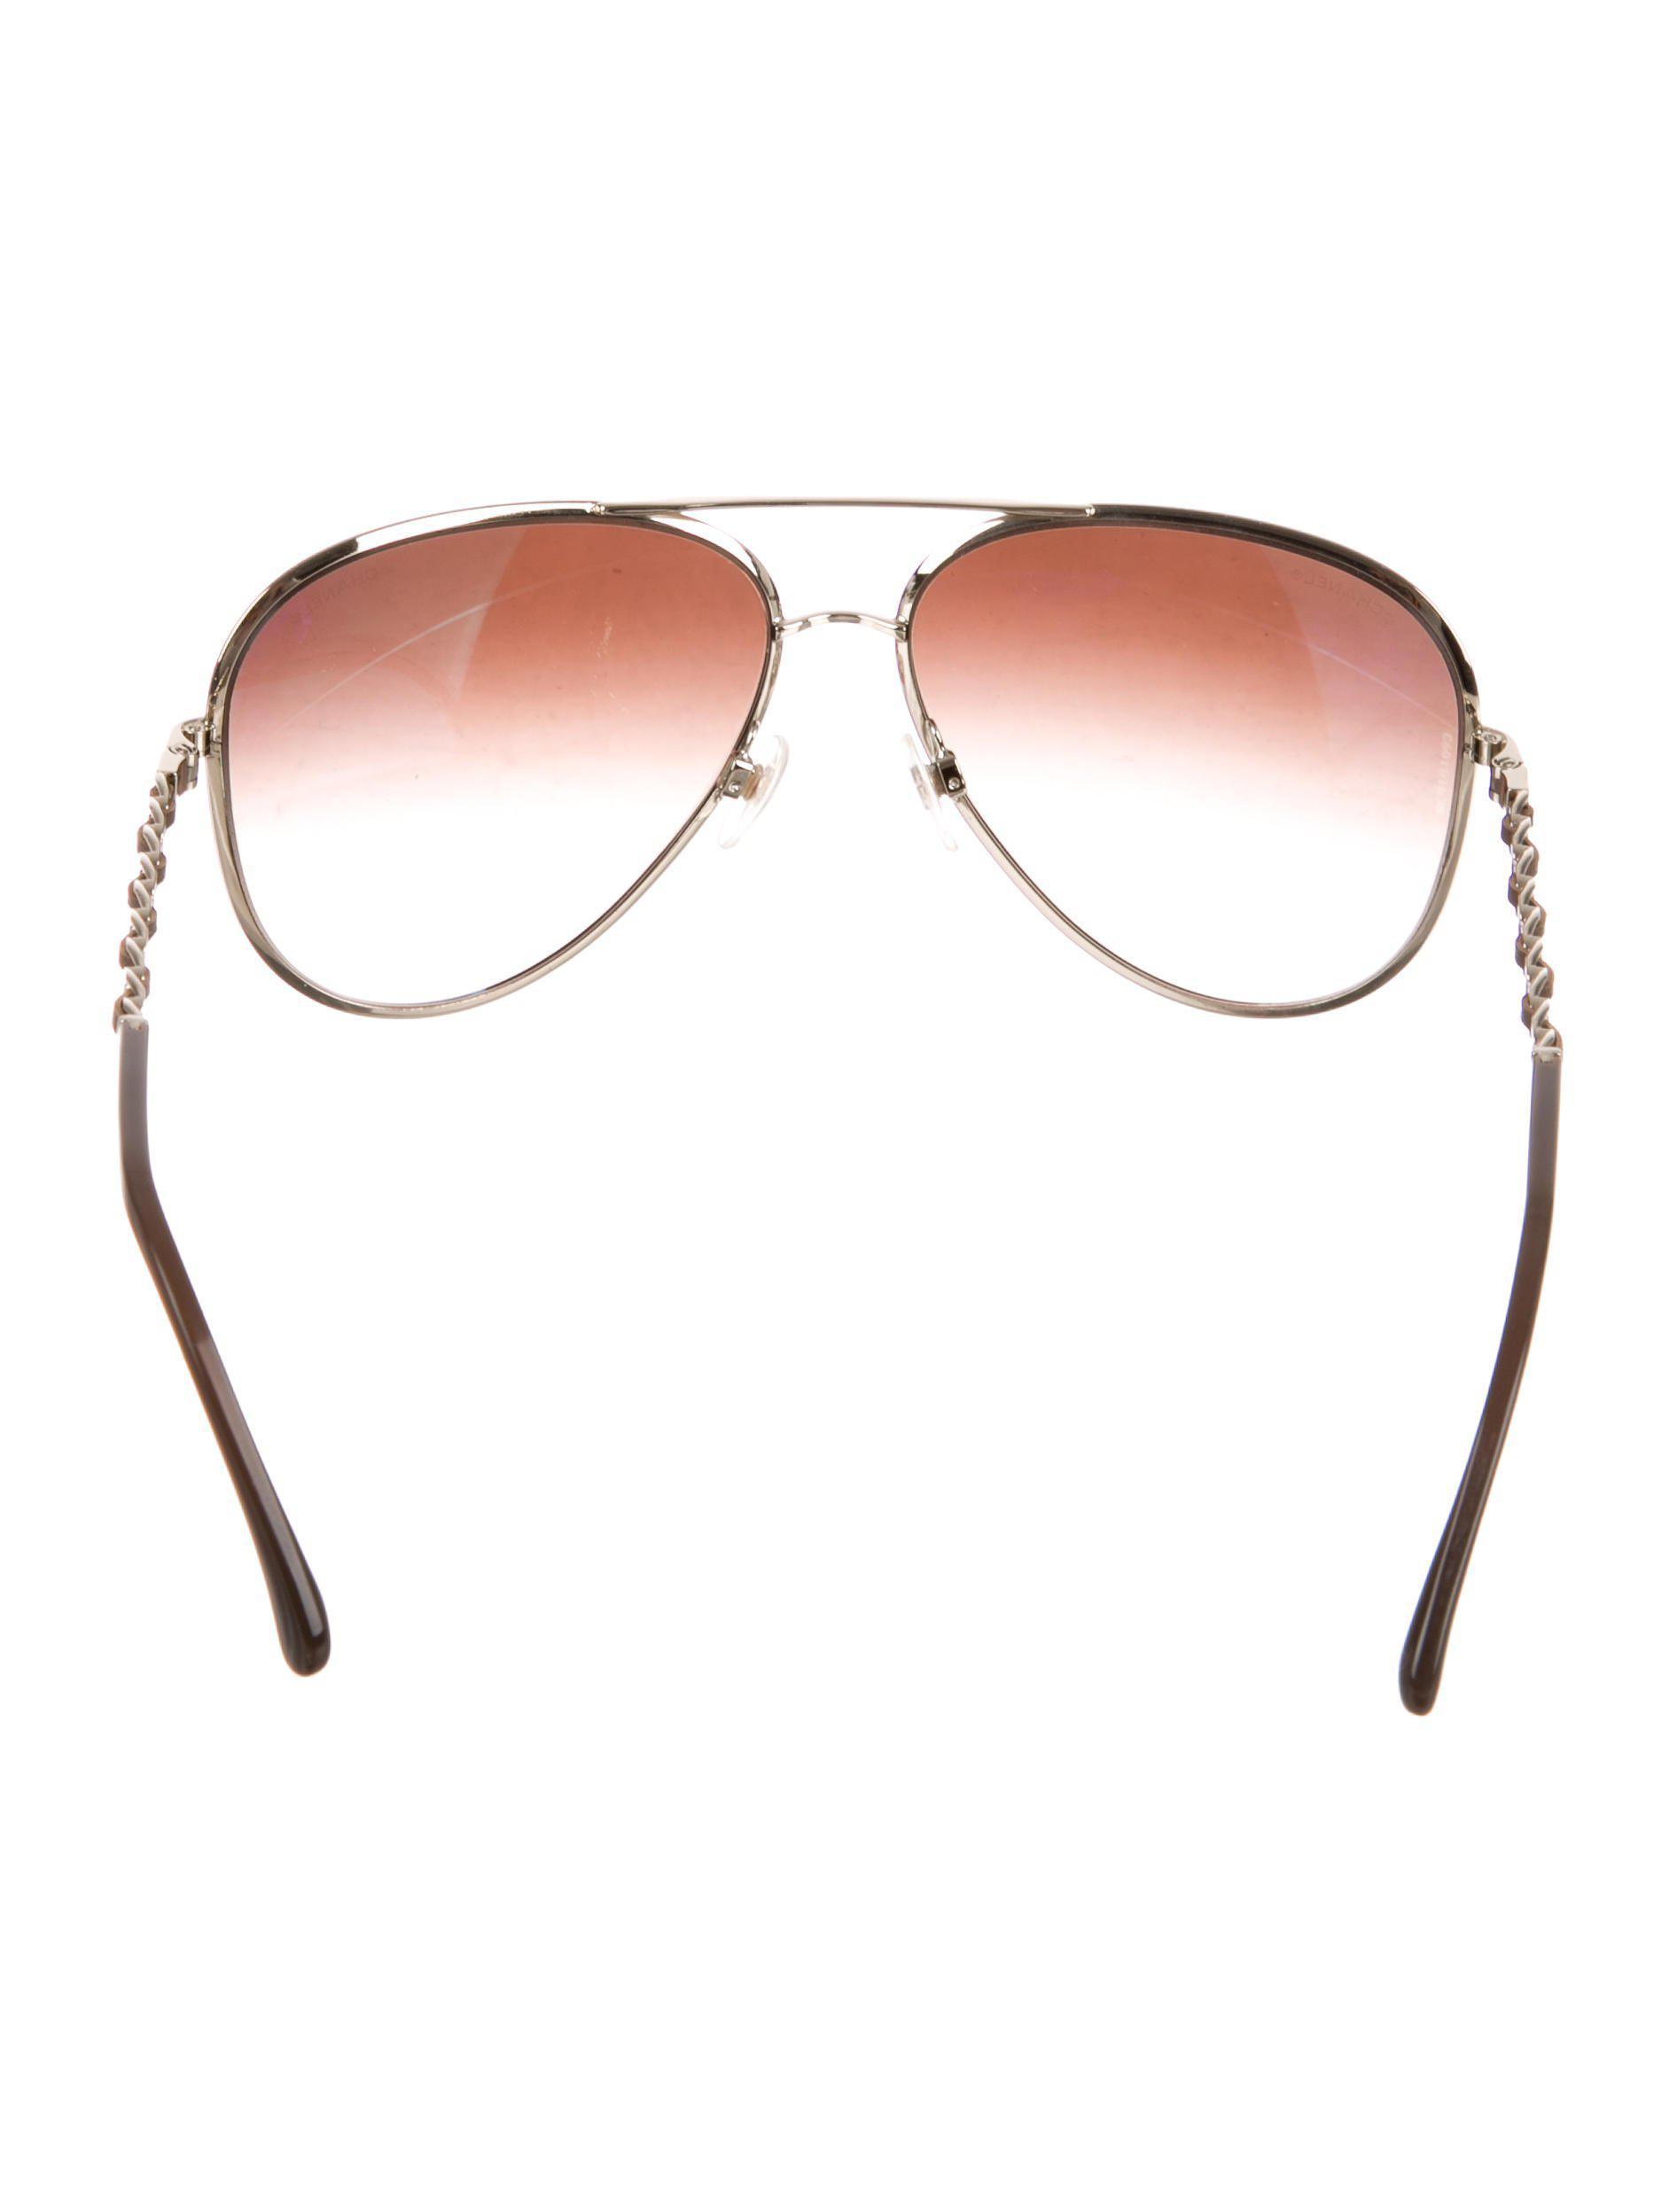 25b015ee3b35 Lyst - Chanel Chain-link Aviator Sunglasses Gold in Metallic